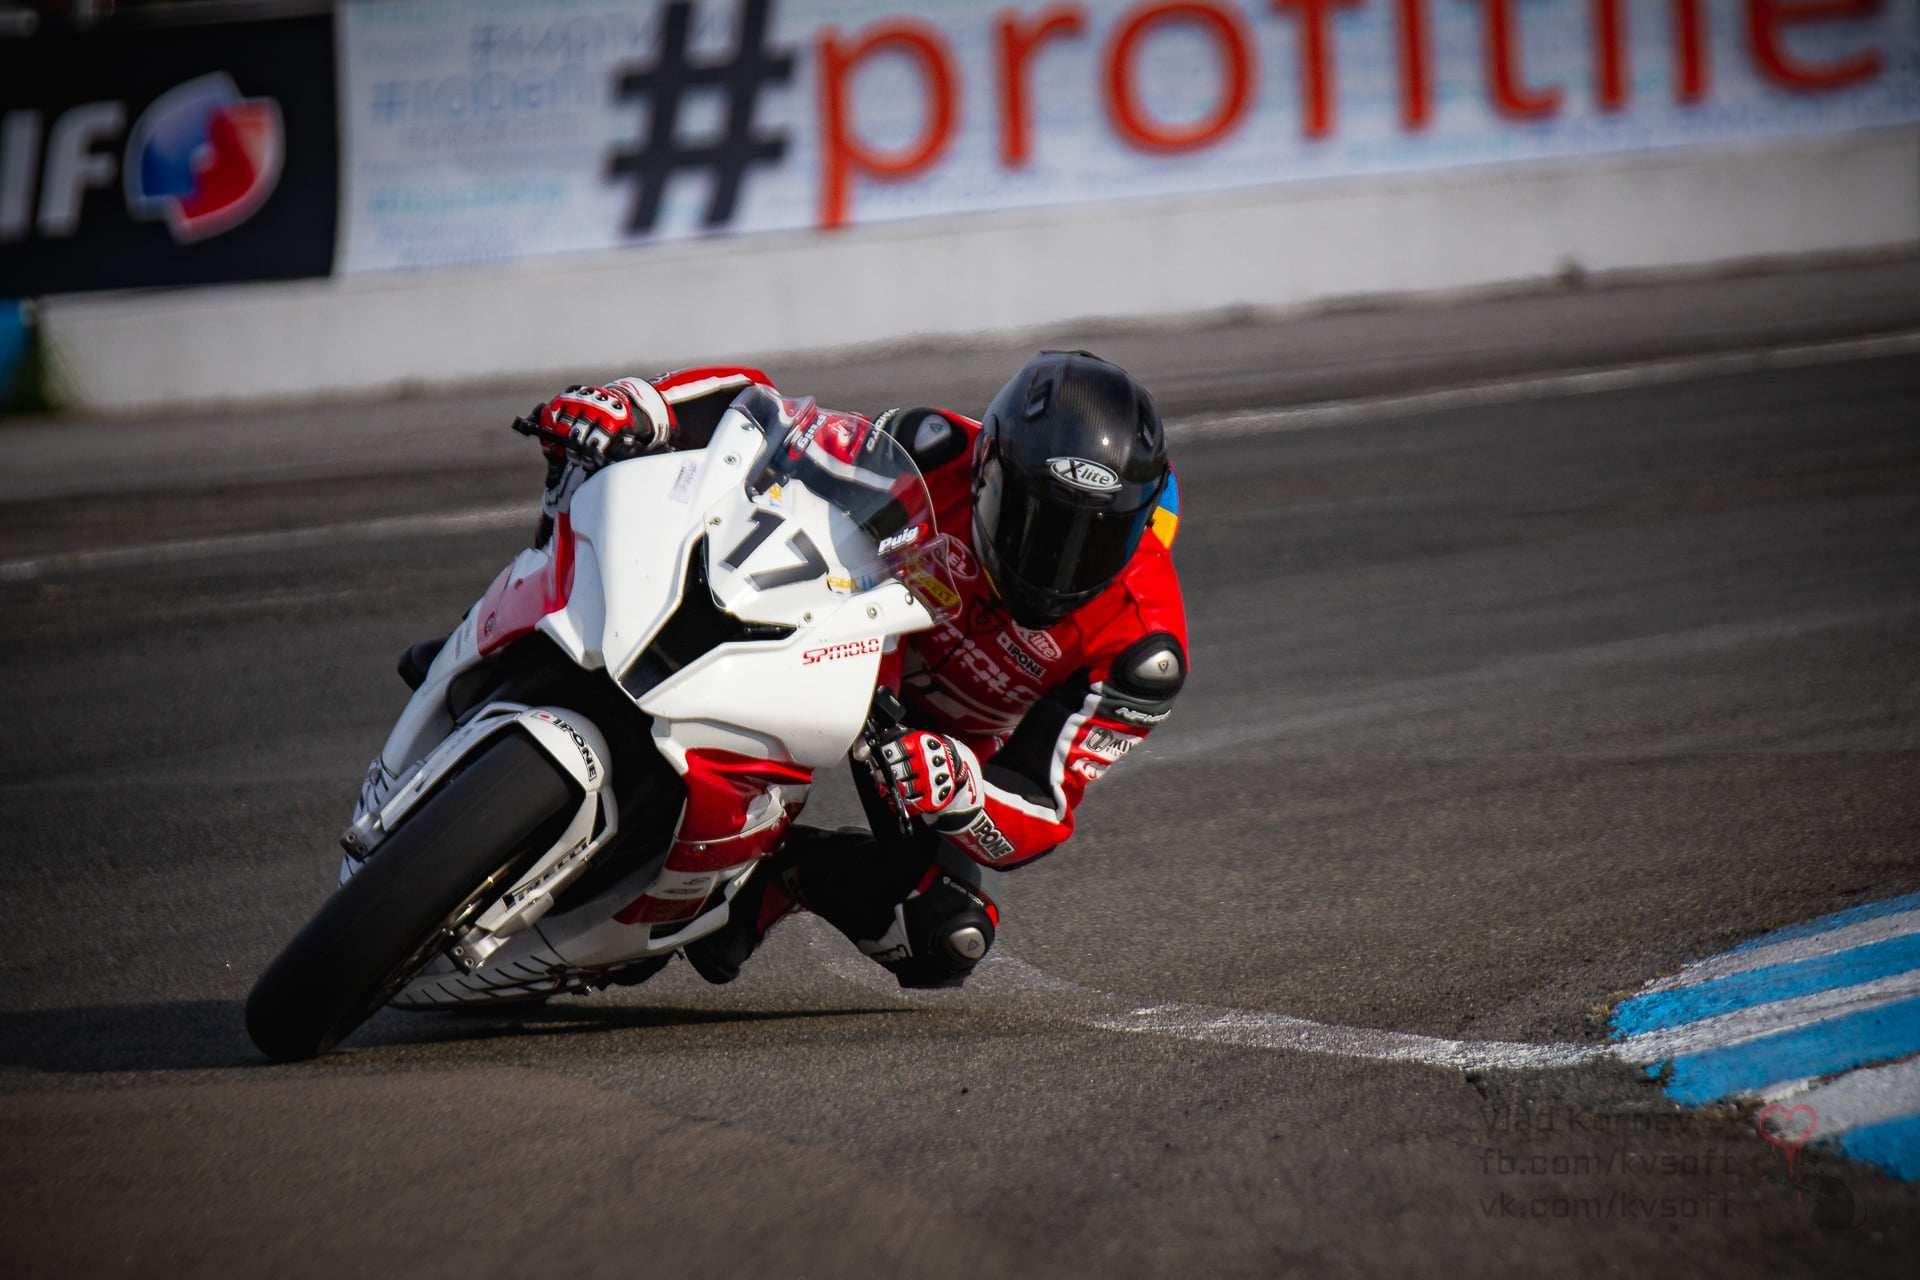 5-6_etap_MotoGPUkraine_117